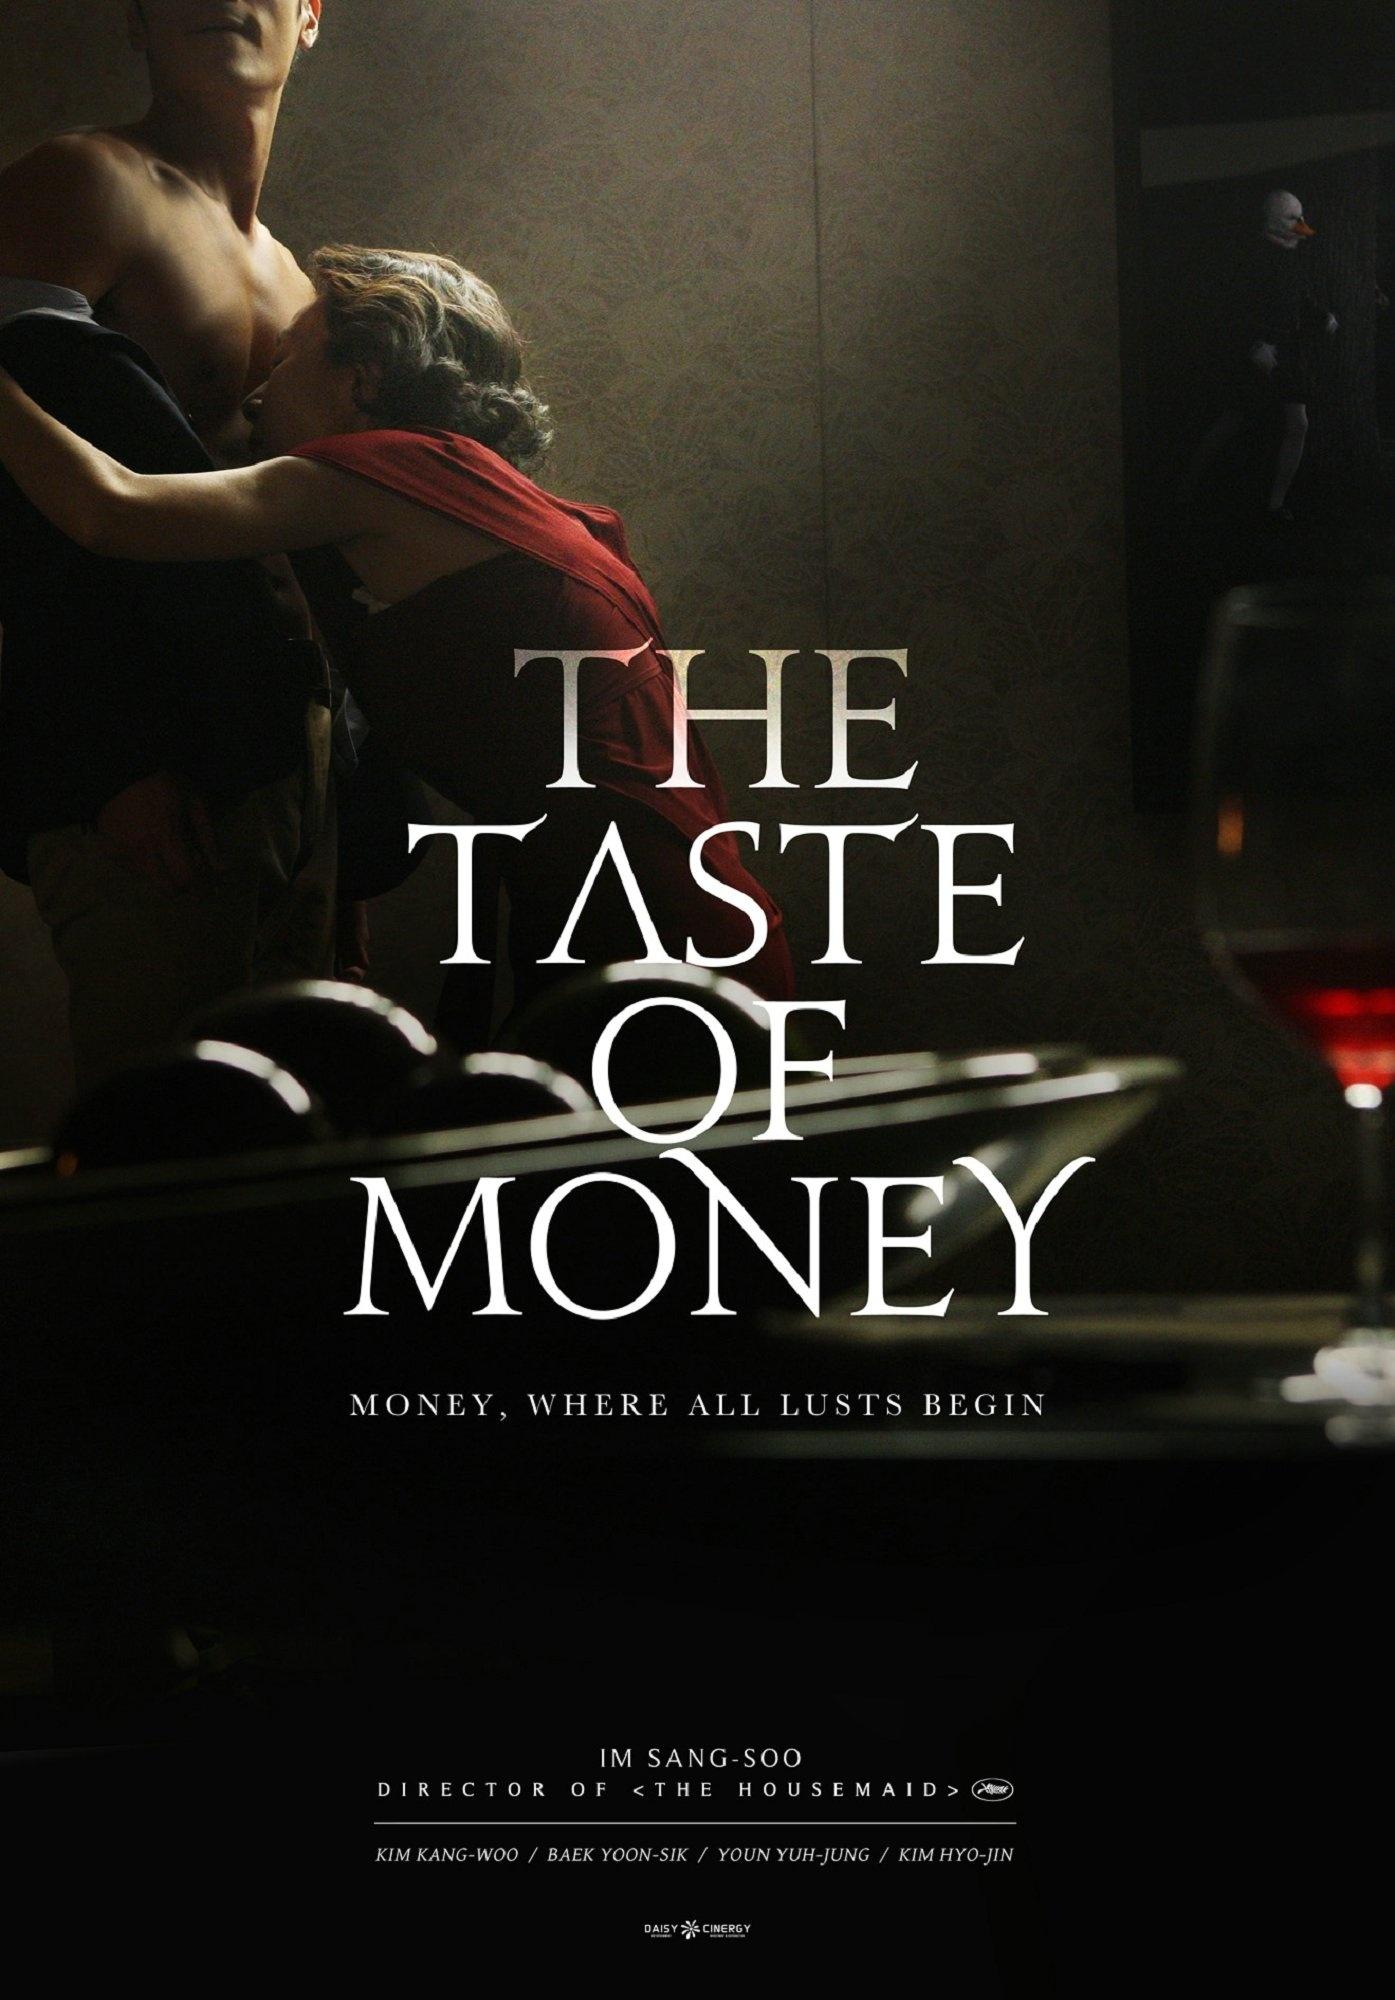 The Taste of Money - Movie Poster #2 (Original)